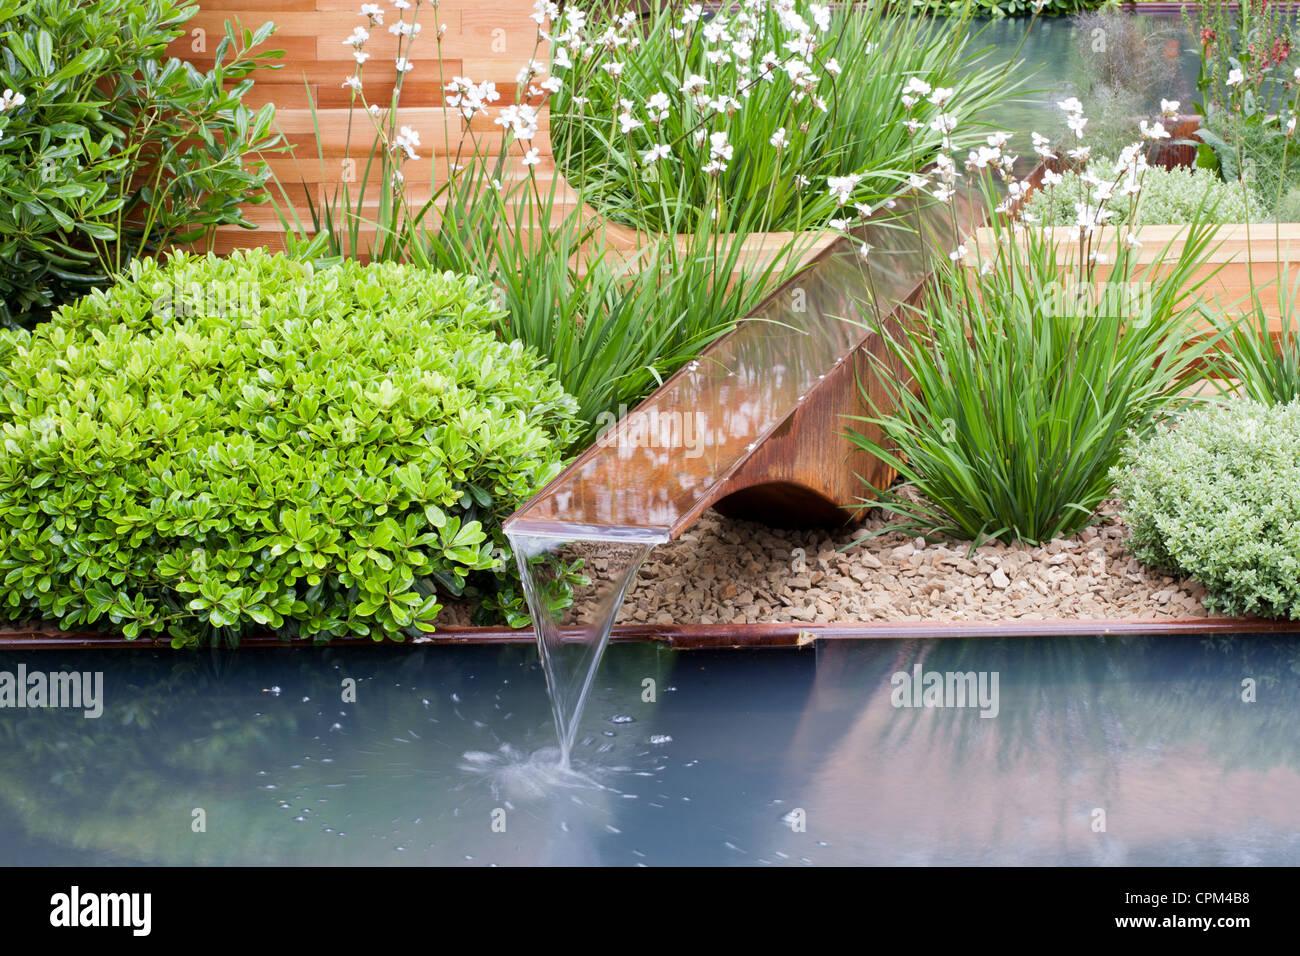 Contemporary Garden Design At RHS Chelsea Flower Show 2012   Homebase  Teenage Cancer Trust Garden, Designer Joe Swift